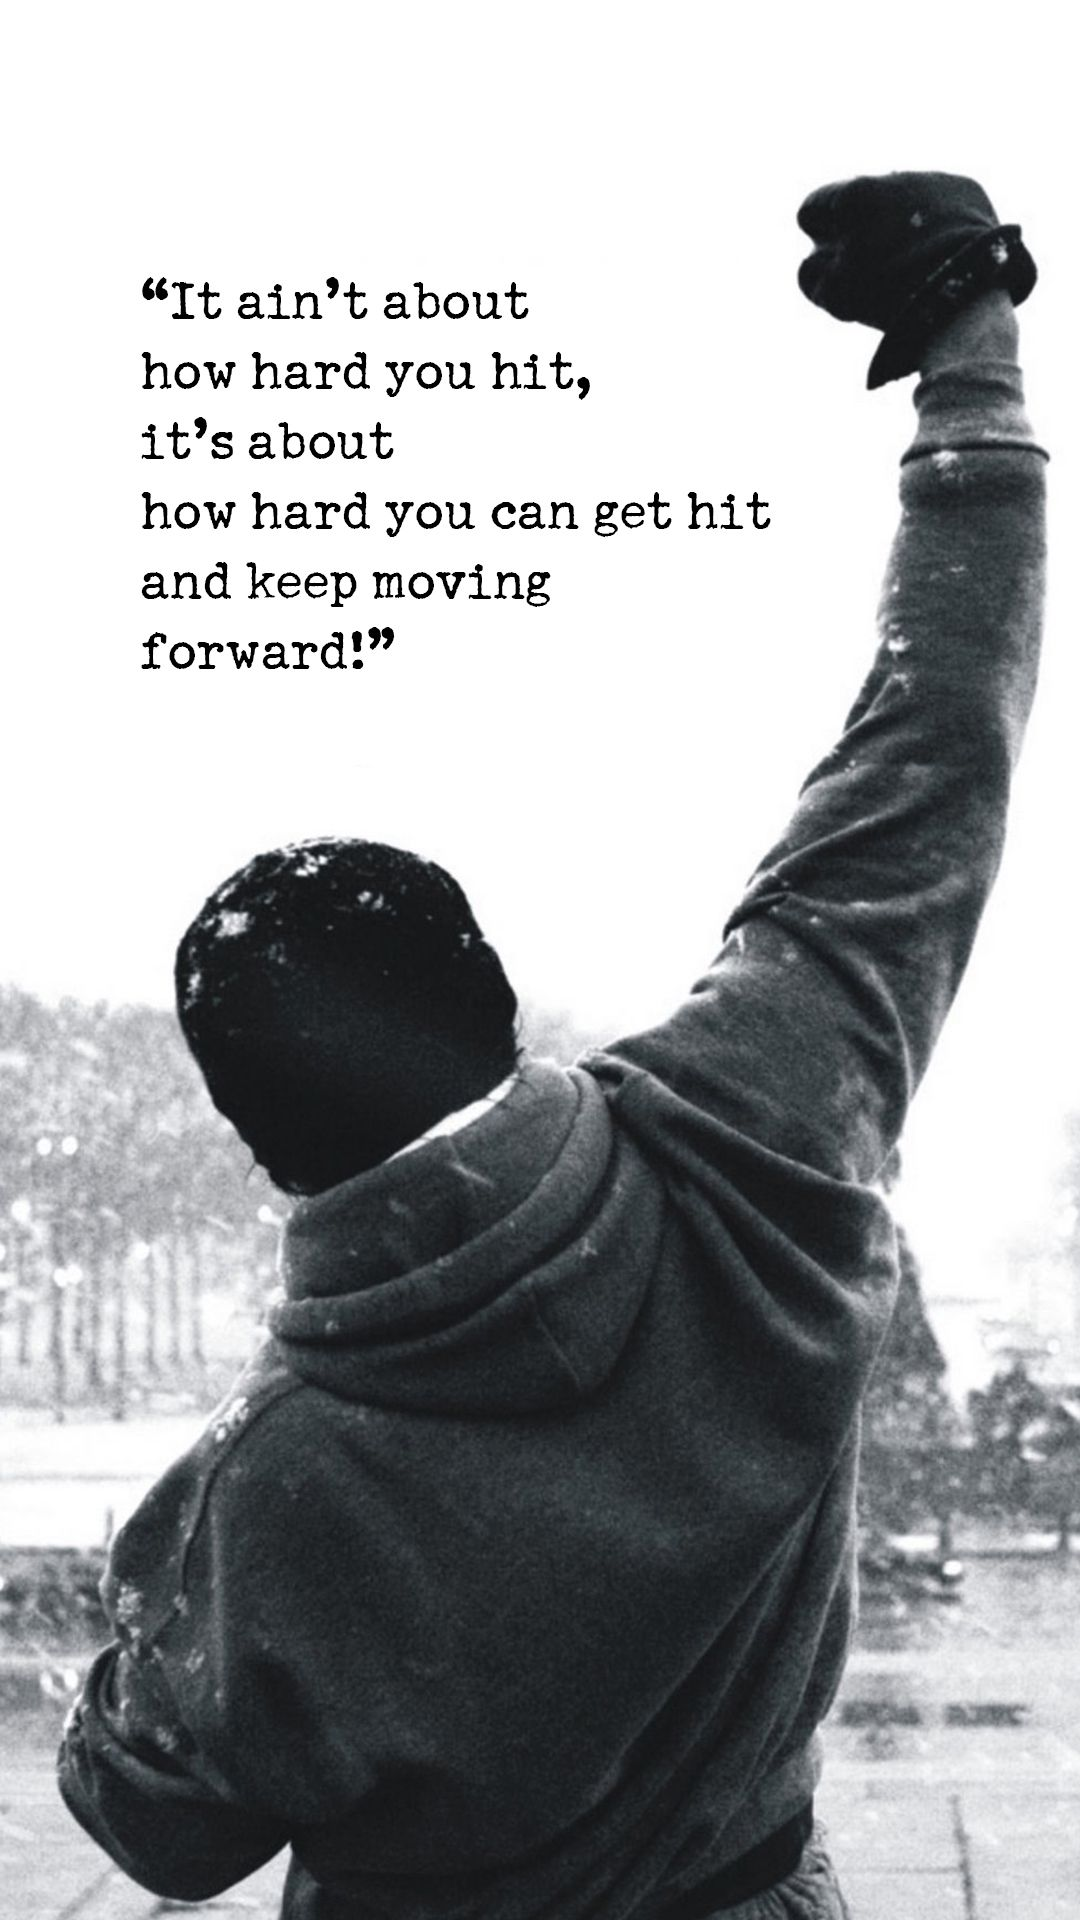 Rocky Balboa Motivational Words iPhone 6 Plus HD Wallpaper motto 1080x1920